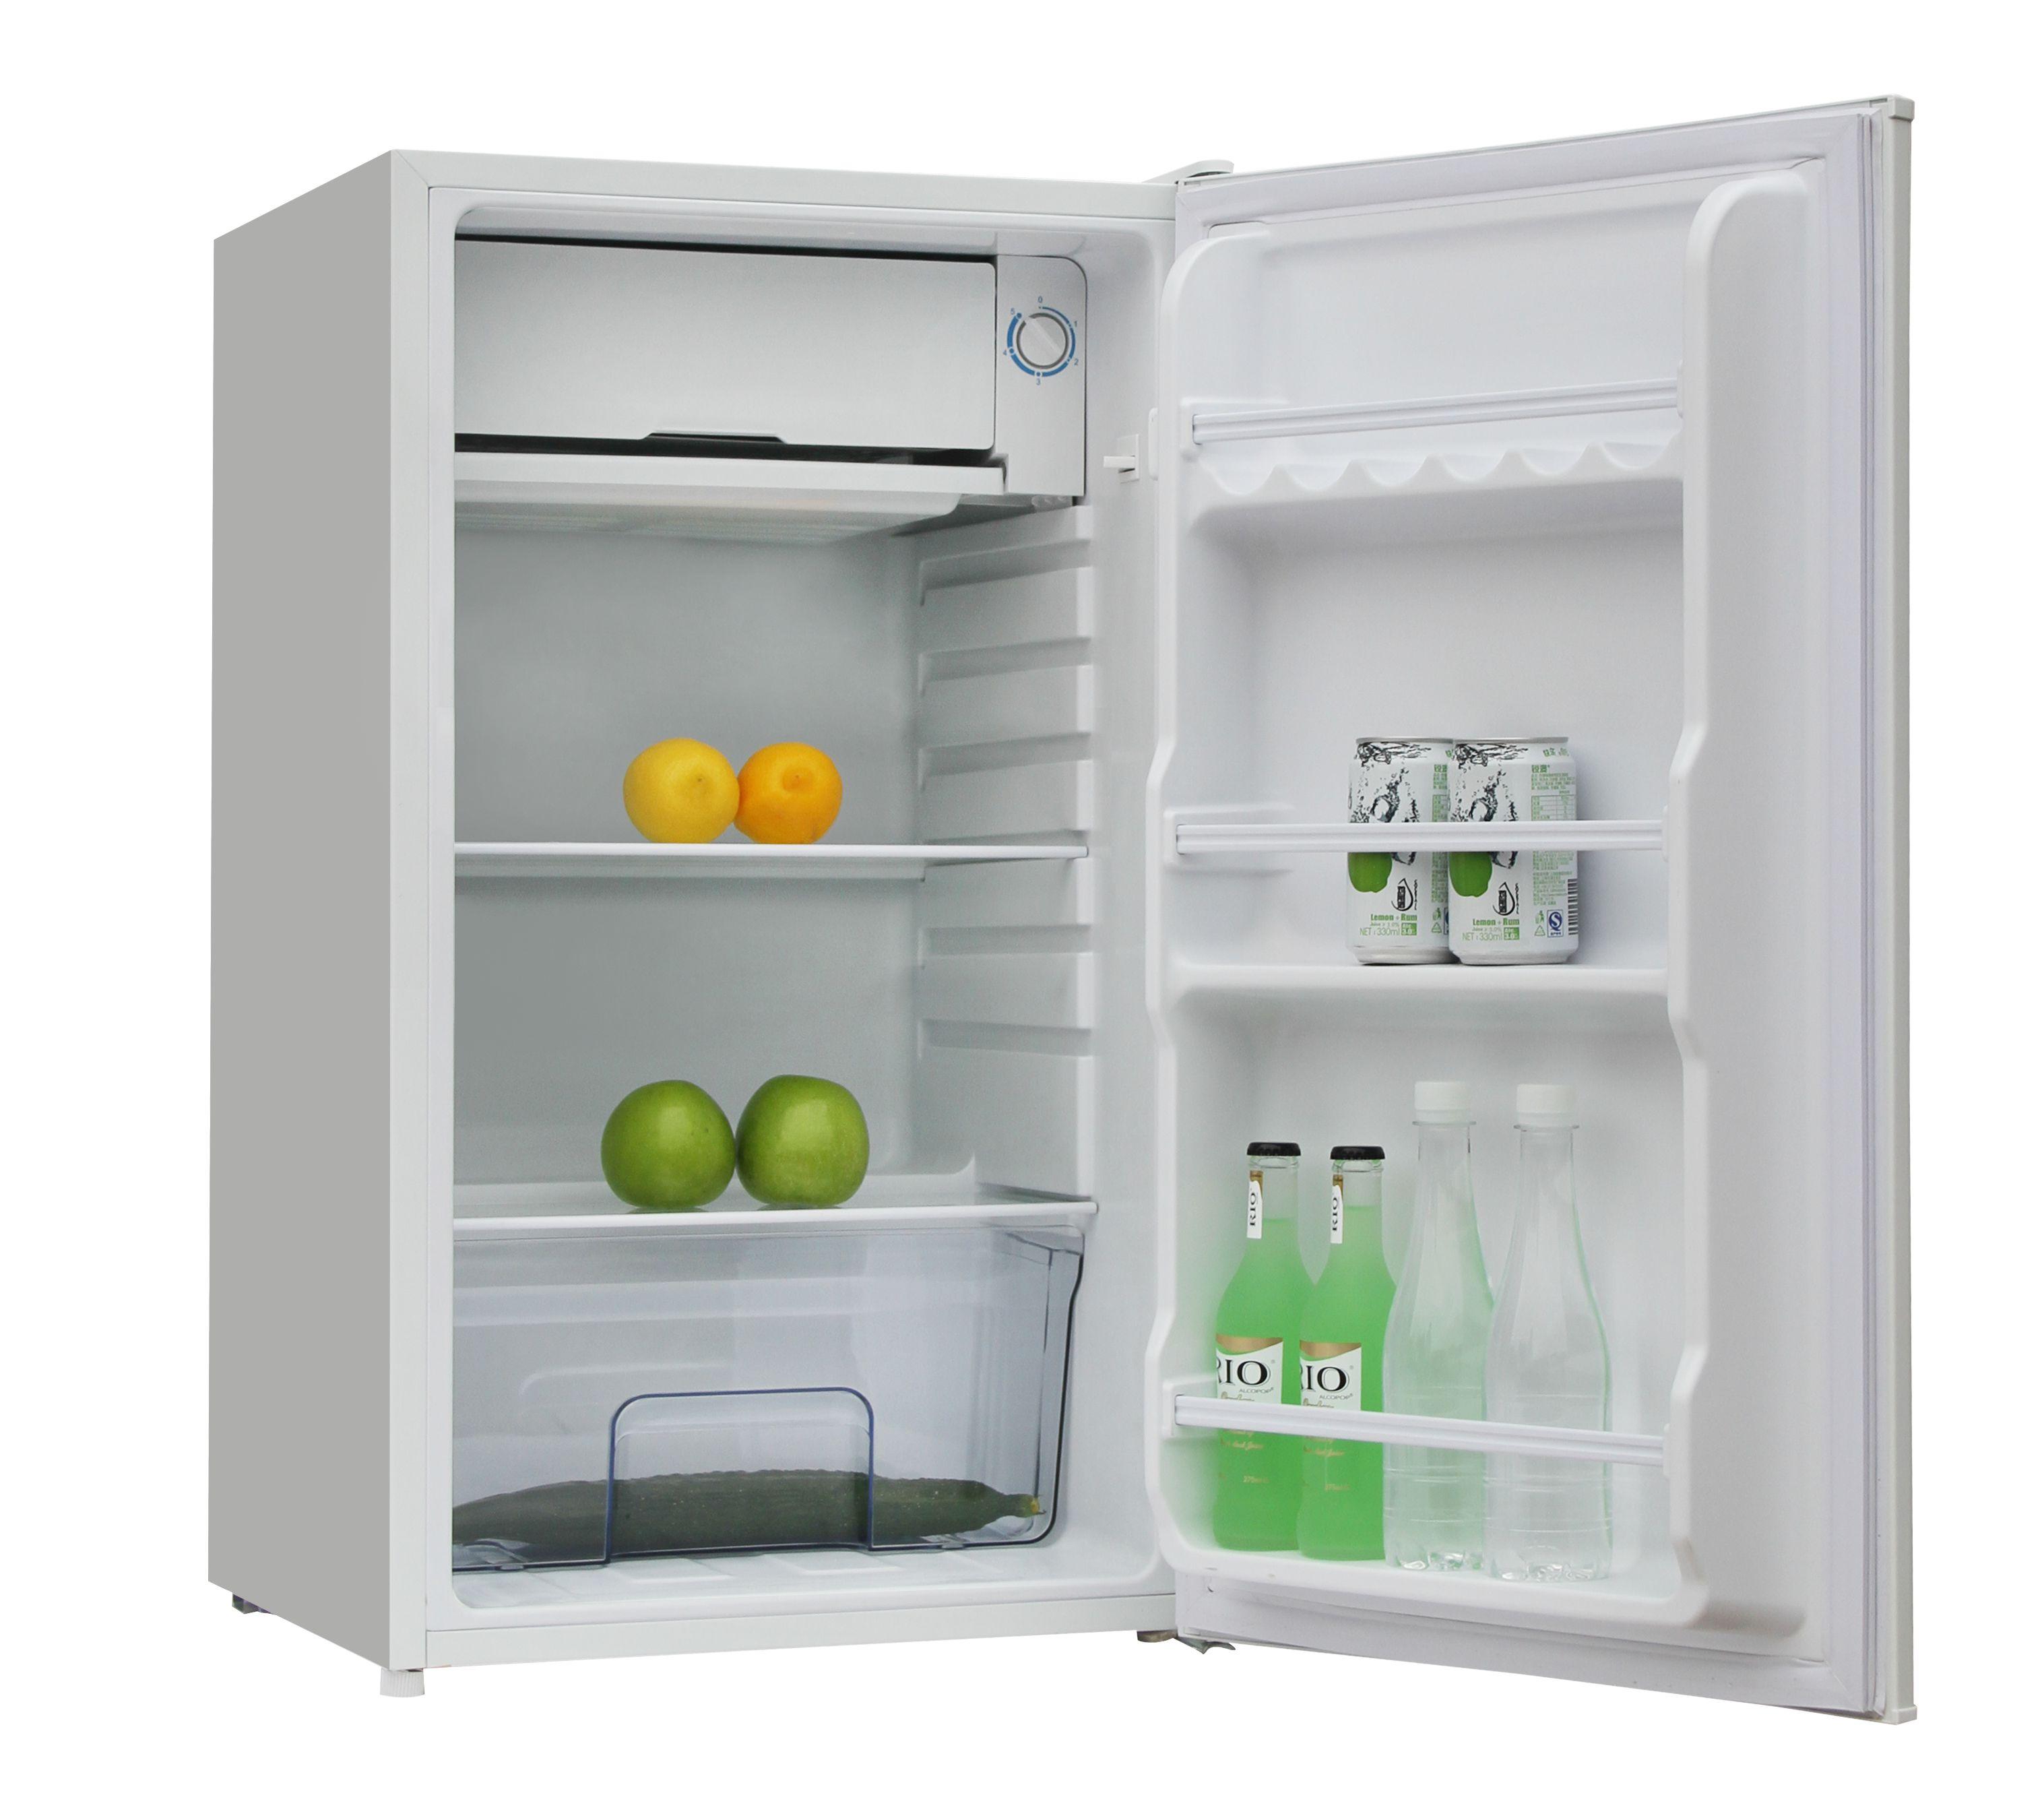 sirge mini frigorifero classe a frigobar frigo 91 litri c. Black Bedroom Furniture Sets. Home Design Ideas